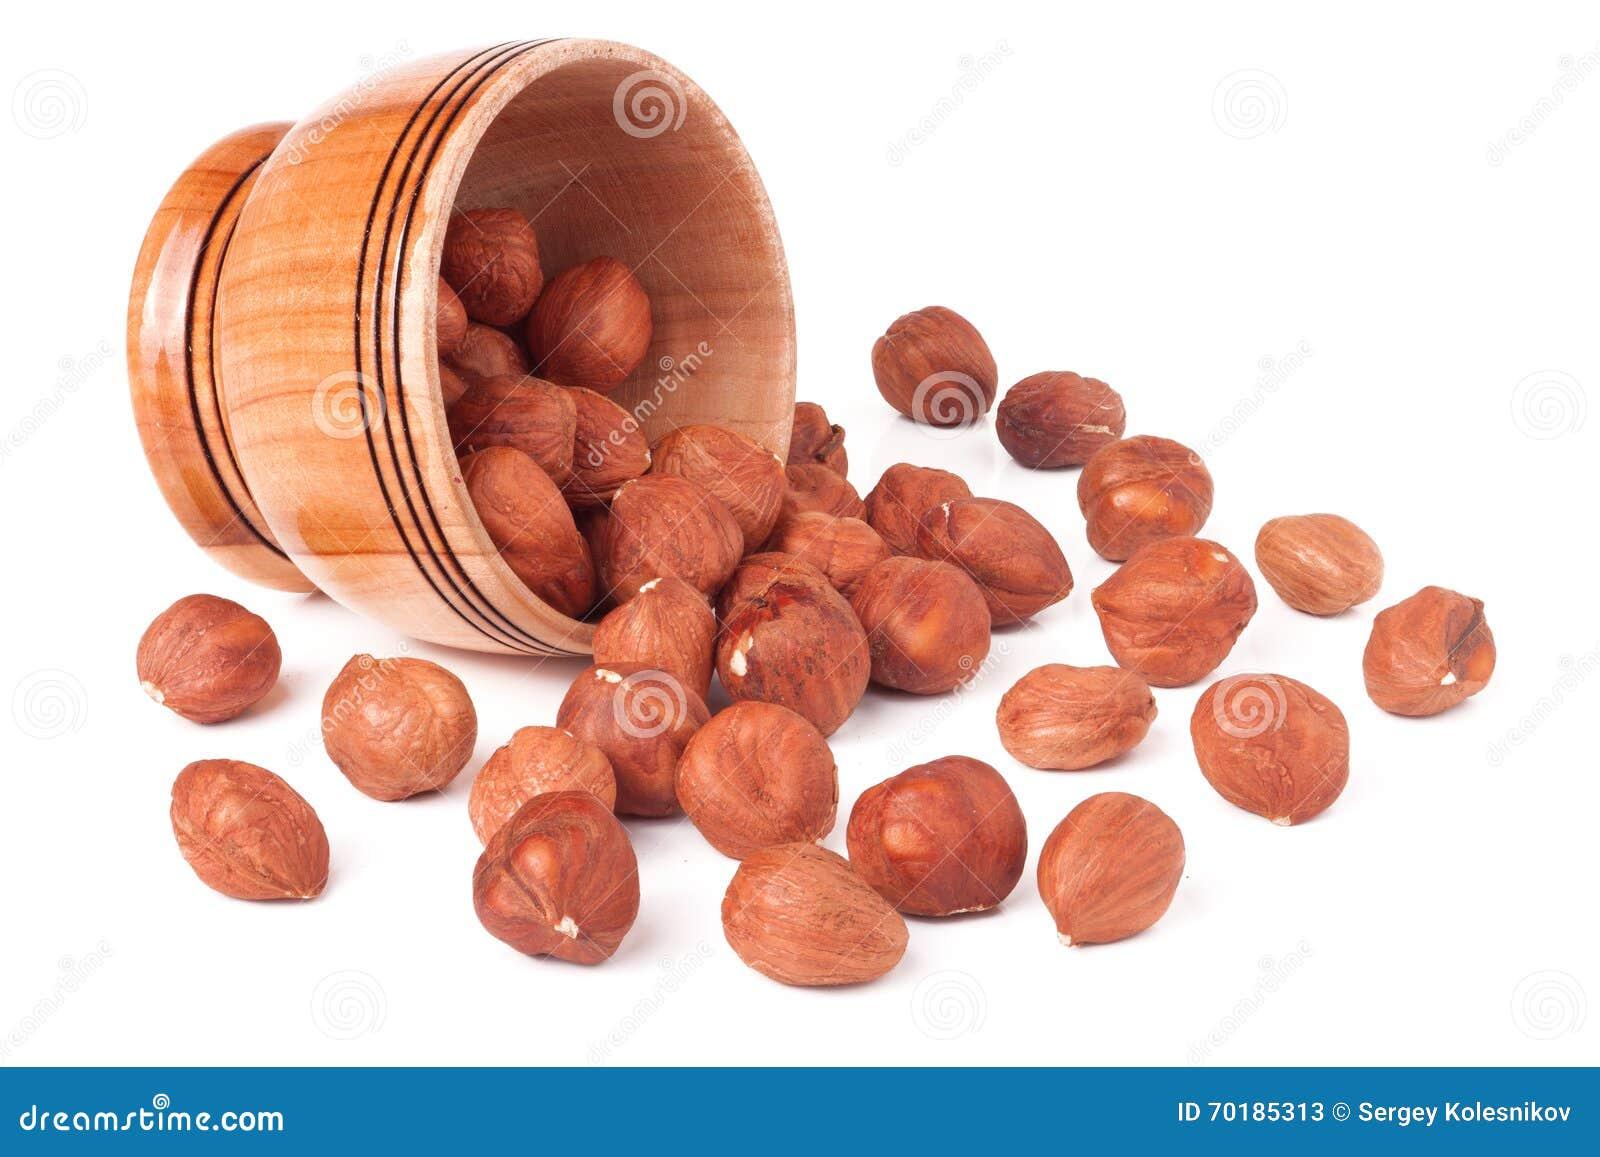 Skalade hasselnötter i en träbunke på vit bakgrund